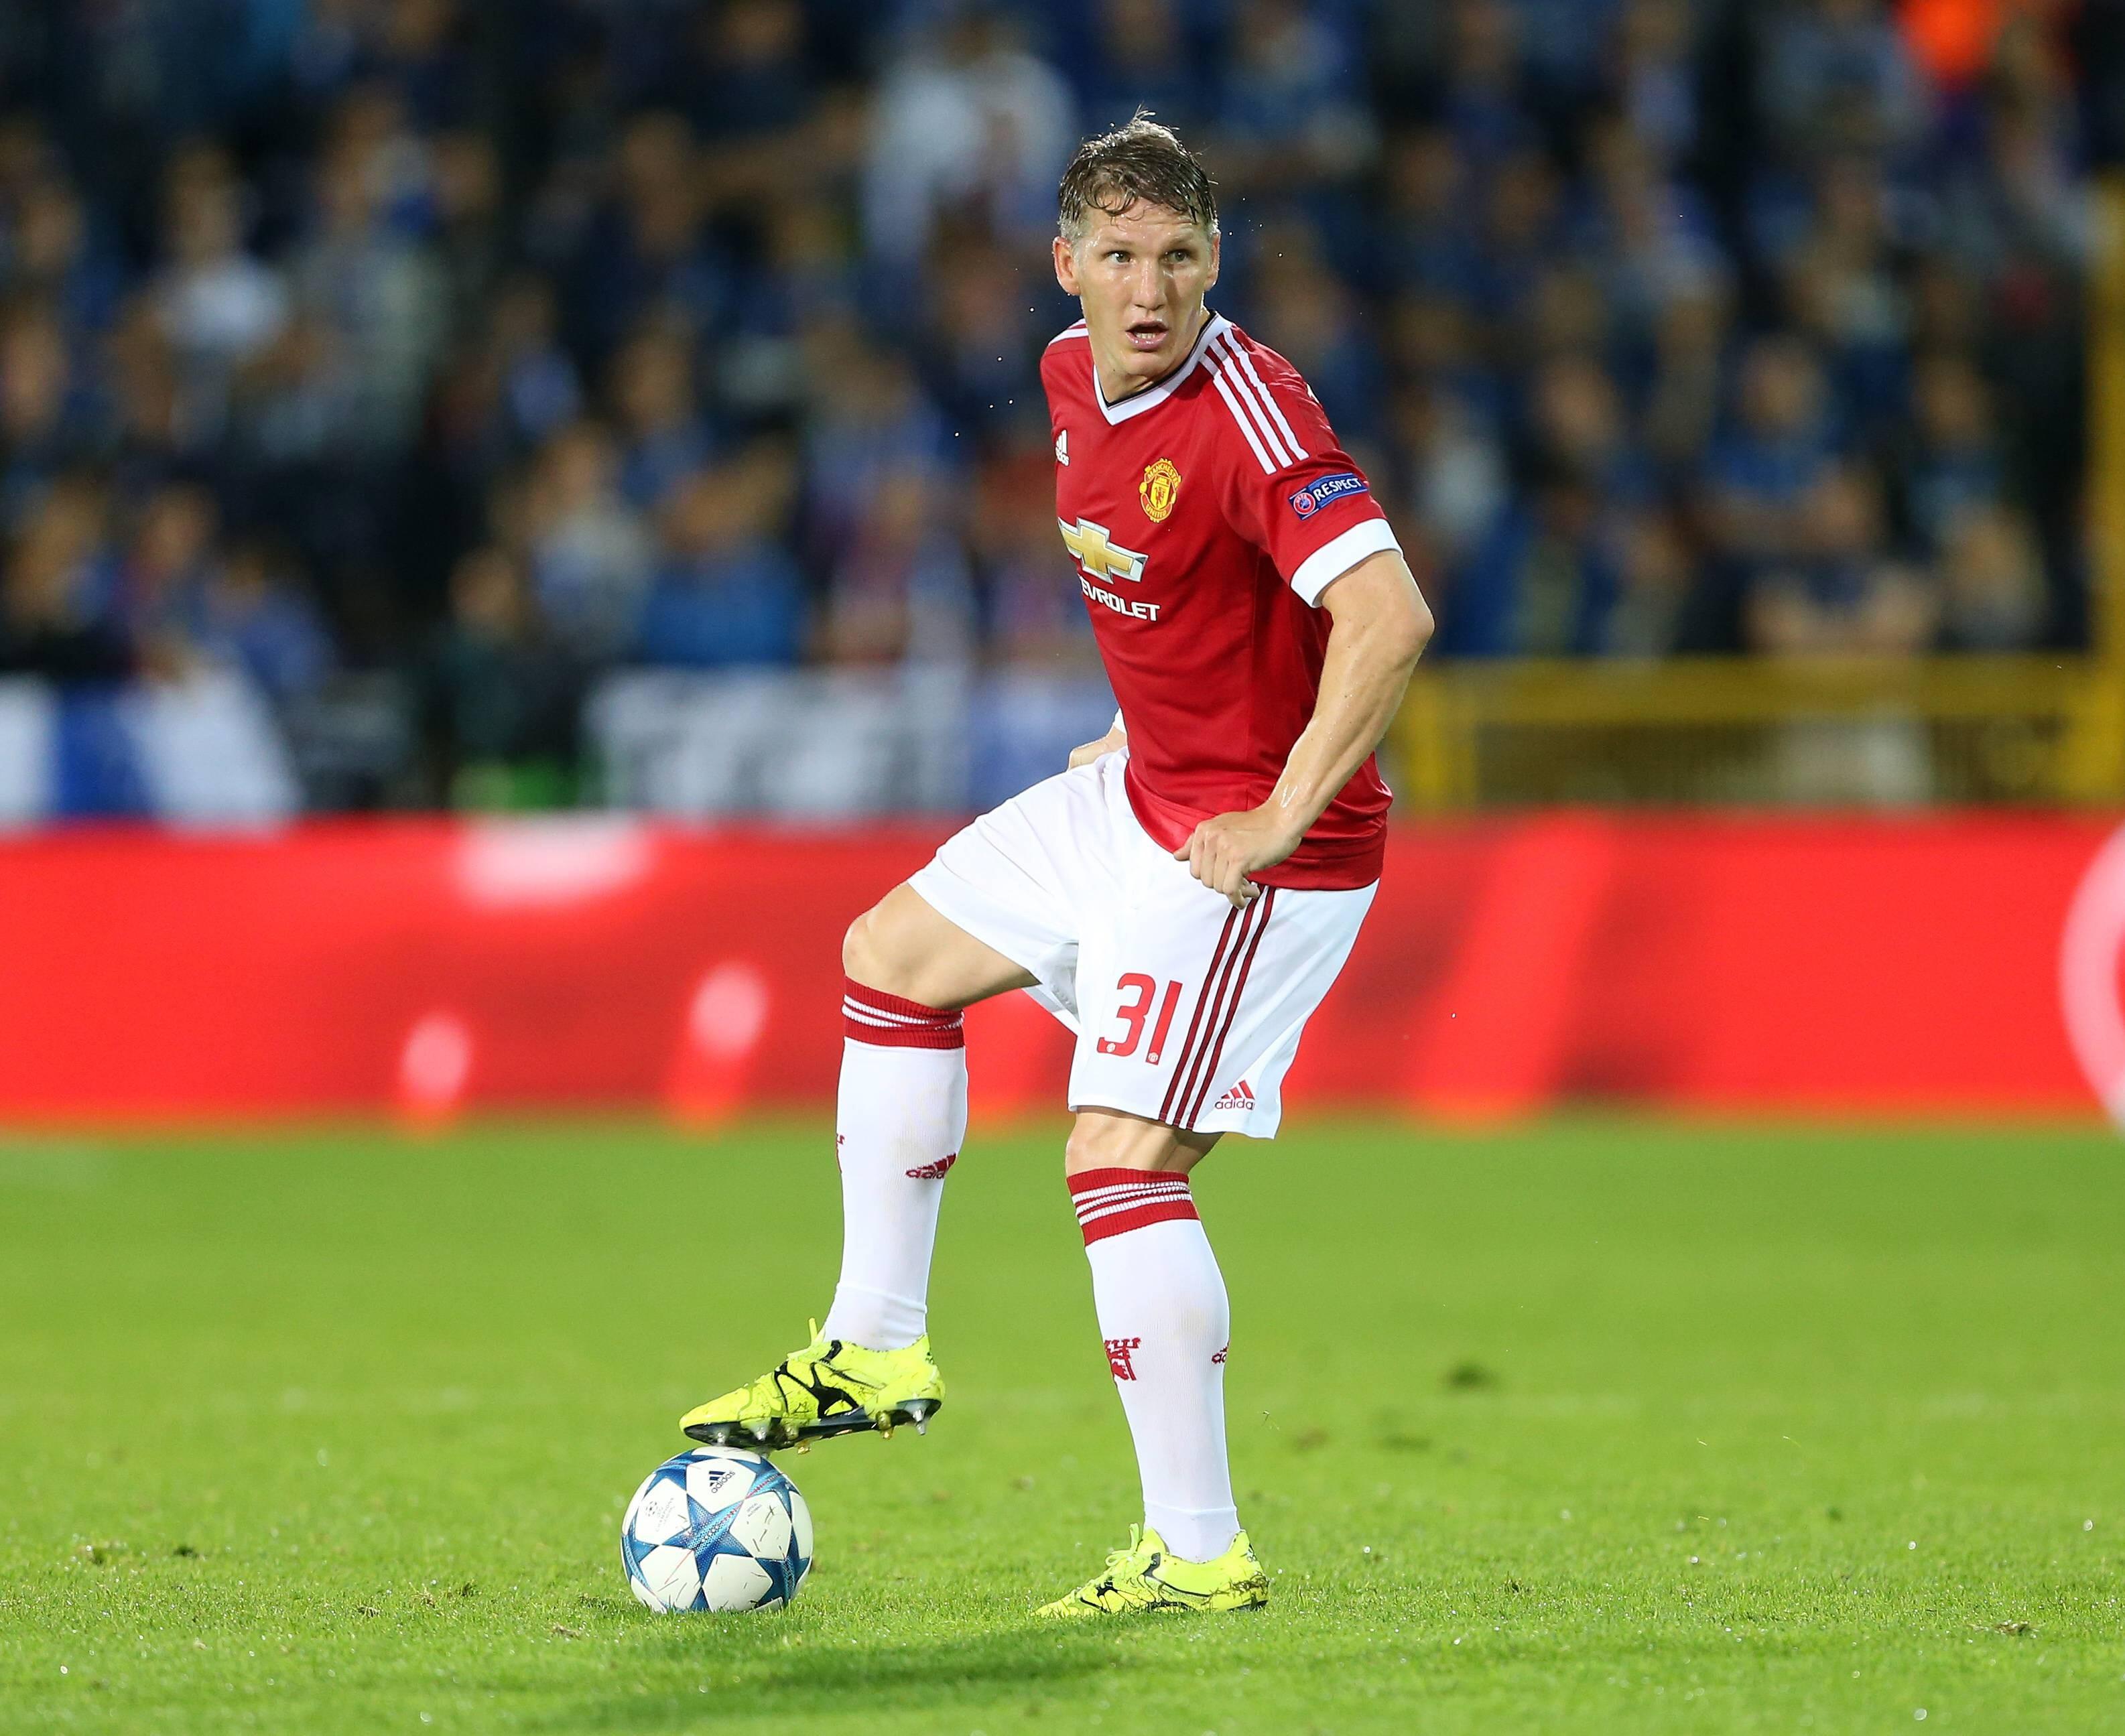 Бастиан Швайнштайгер («Манчестер Юнайтед»)